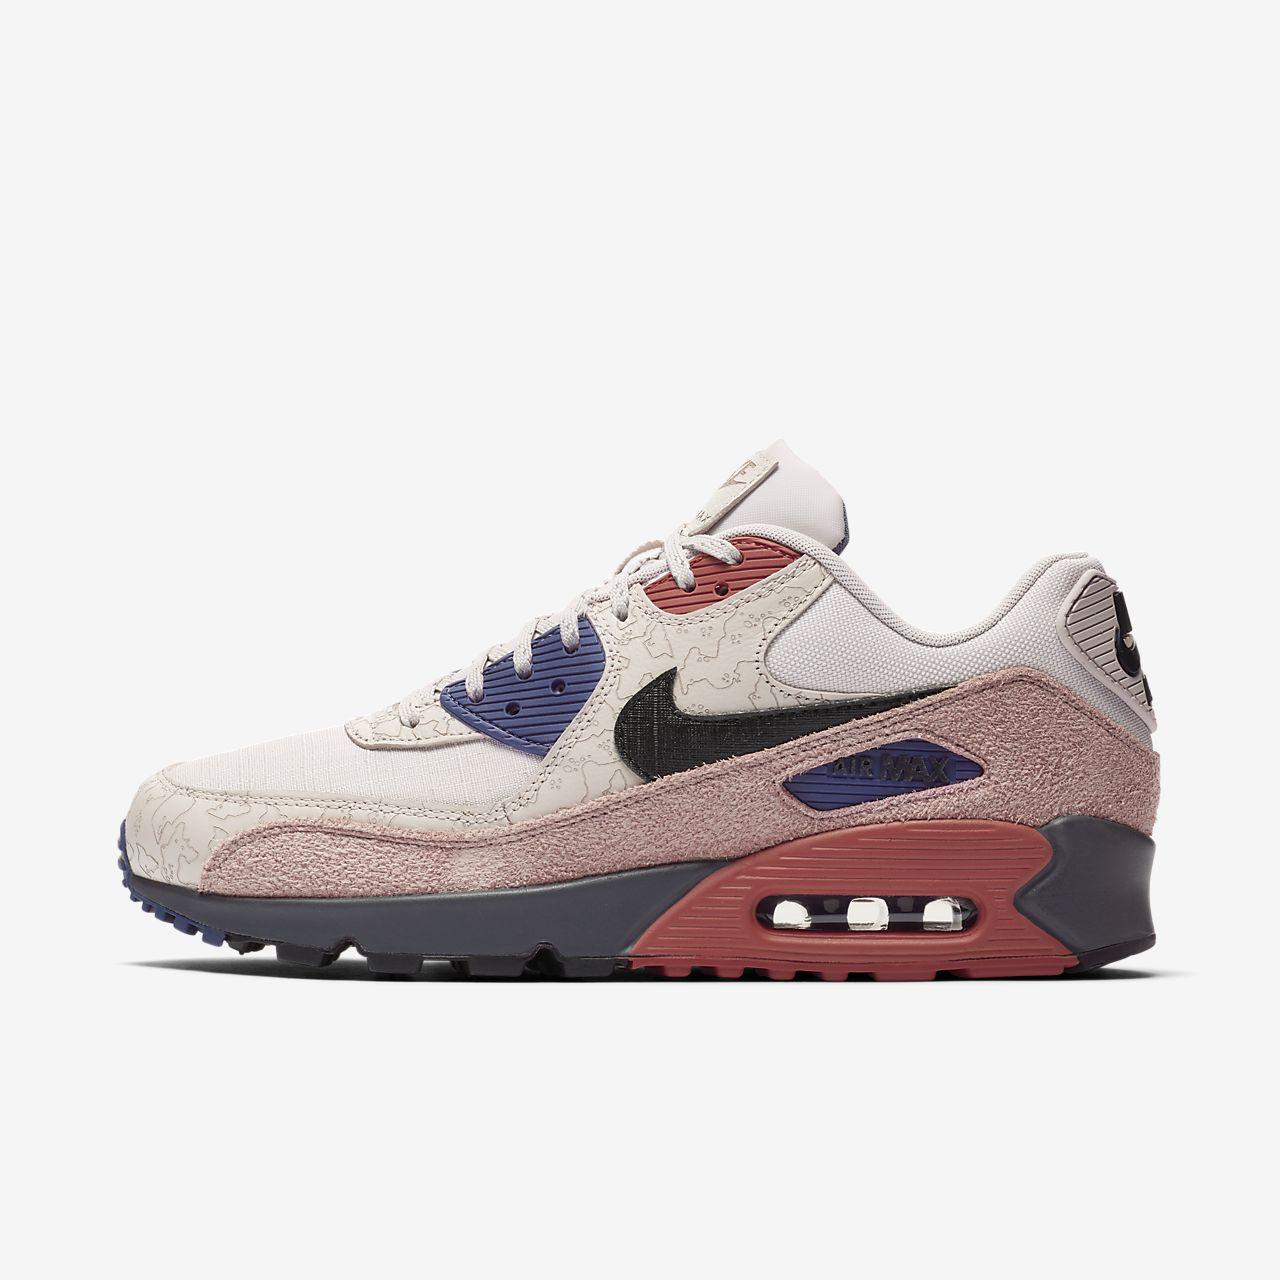 Nike Air Max 90 Sneakerboot Winter Black aislaclick